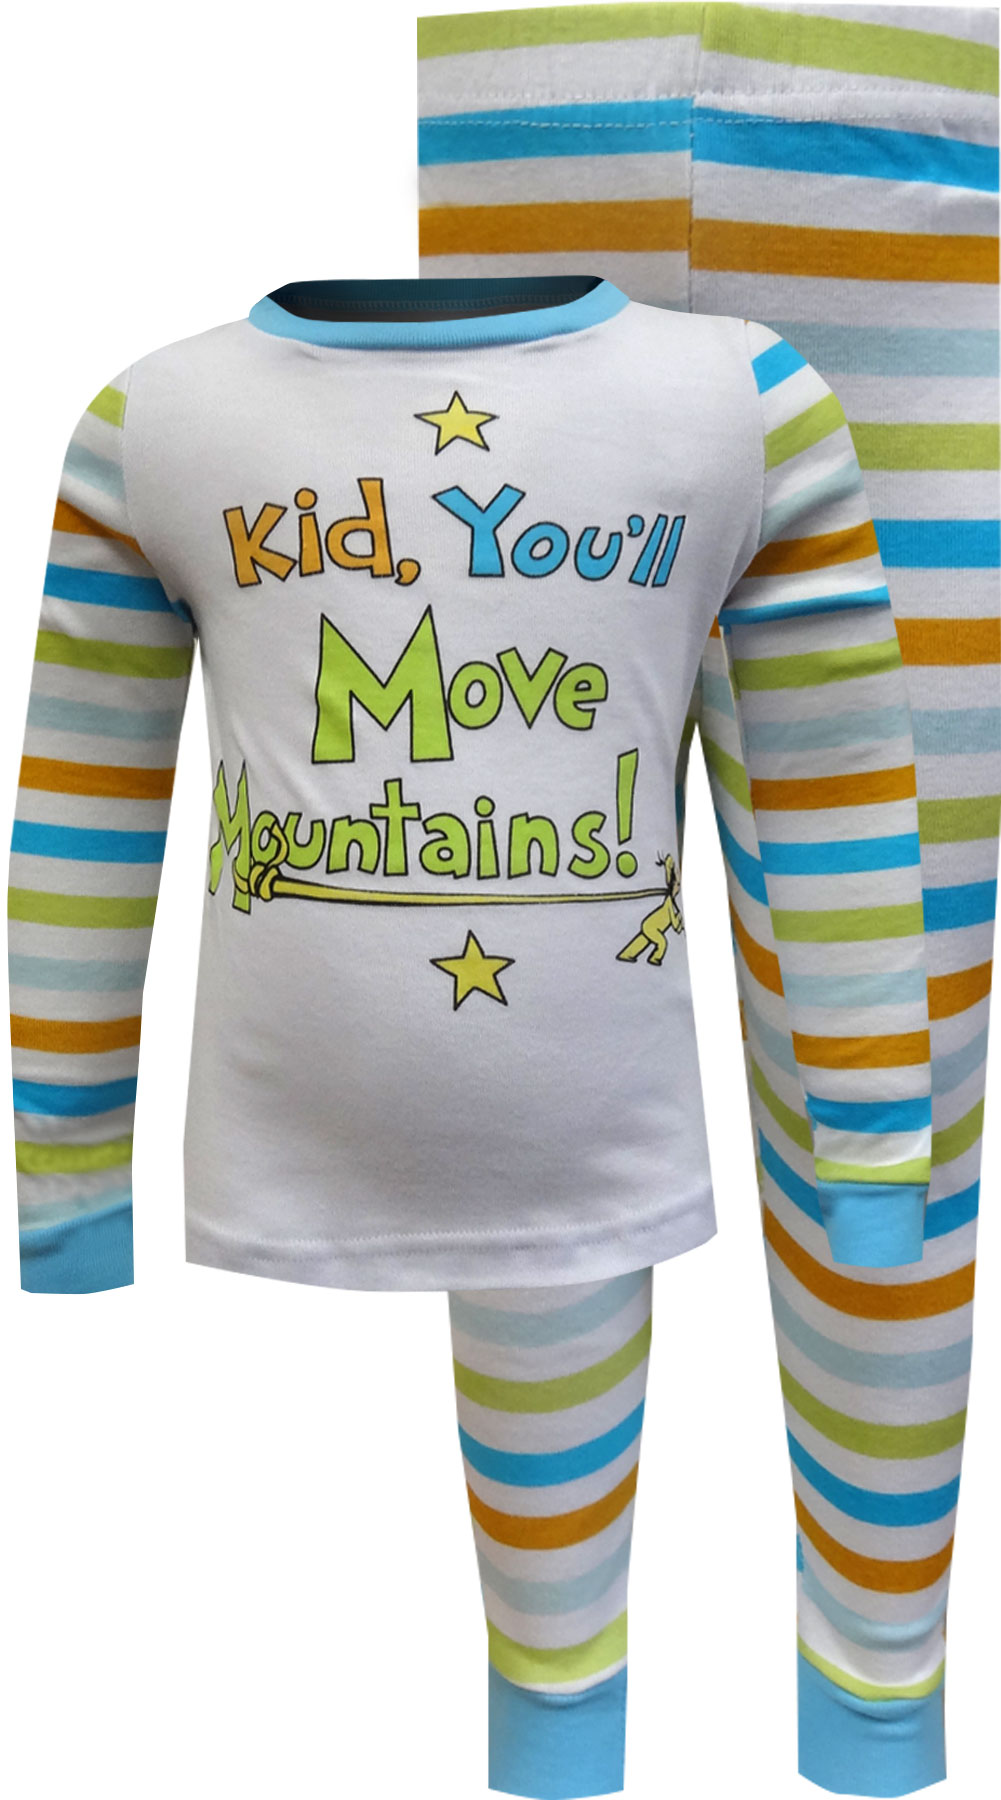 Image of Dr Seuss Kid, You'll Move Mountains Pajamas for boys